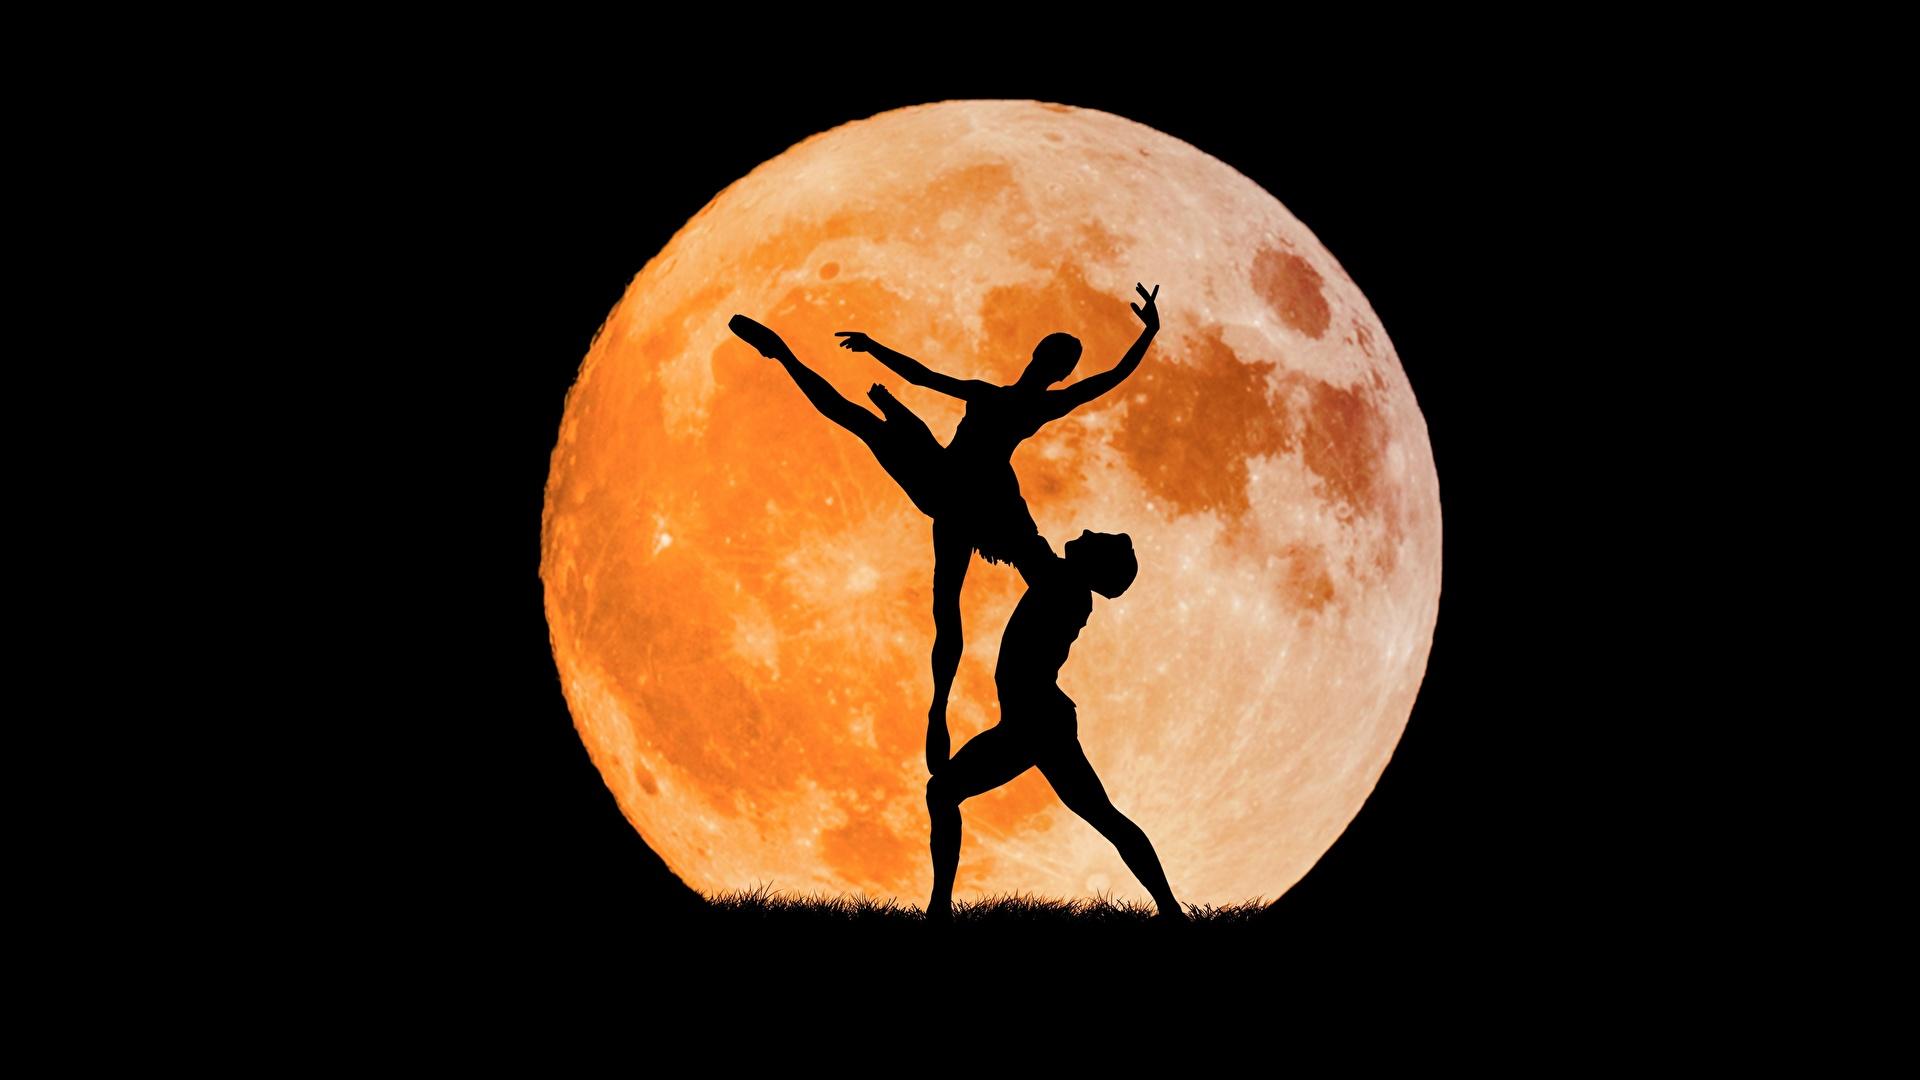 Обои для рабочего стола Балет силуэты луны 1920x1080 балете балета Силуэт силуэта Луна луной